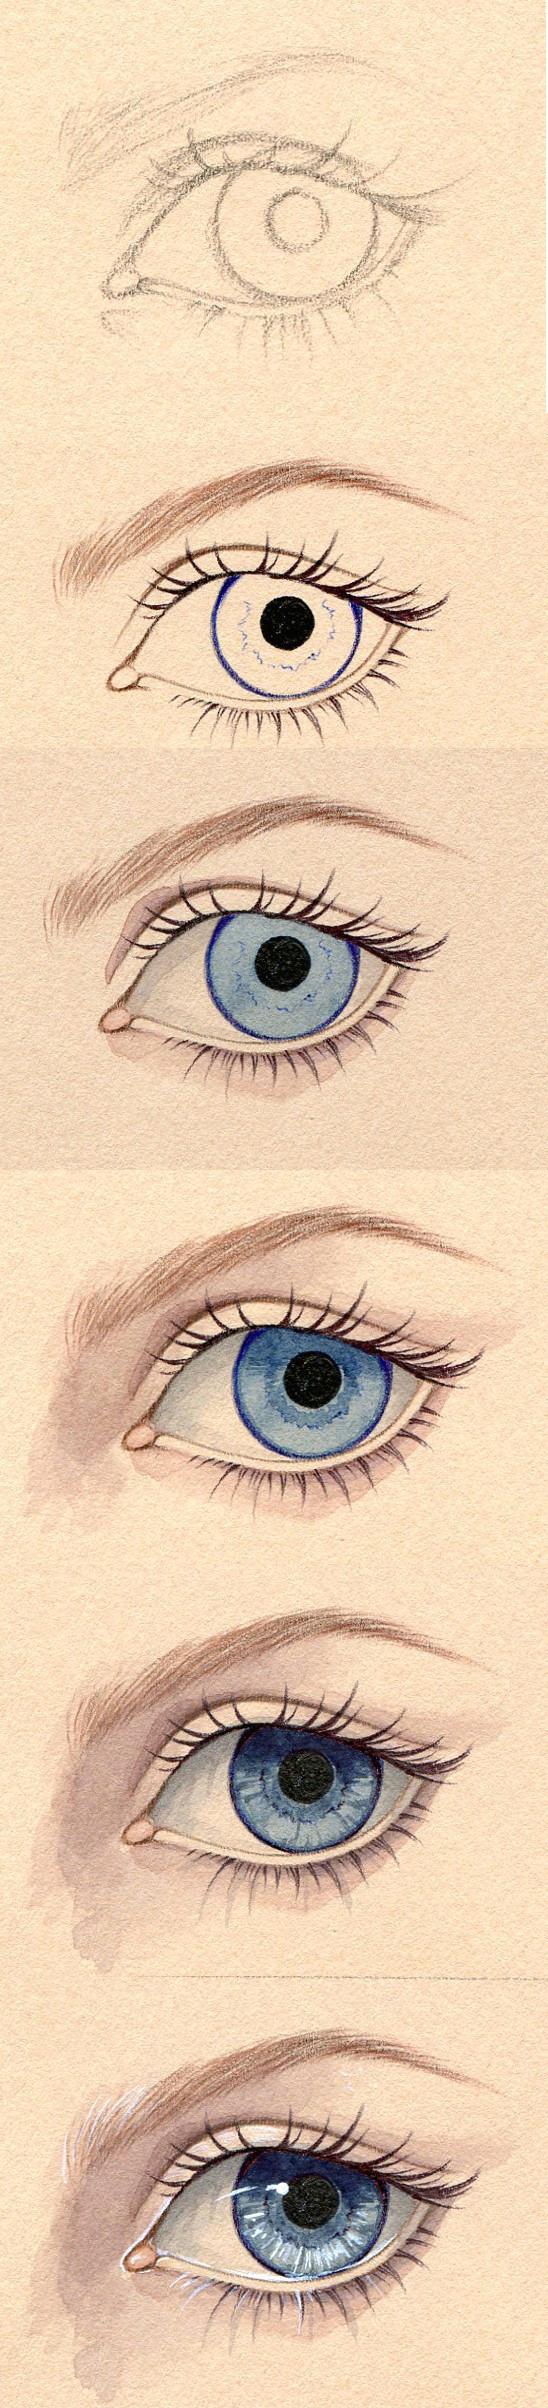 Drawing Eyes Tutorial Deviantart Eye Tutorial by Neko Art Deviantart Com On Deviantart Human